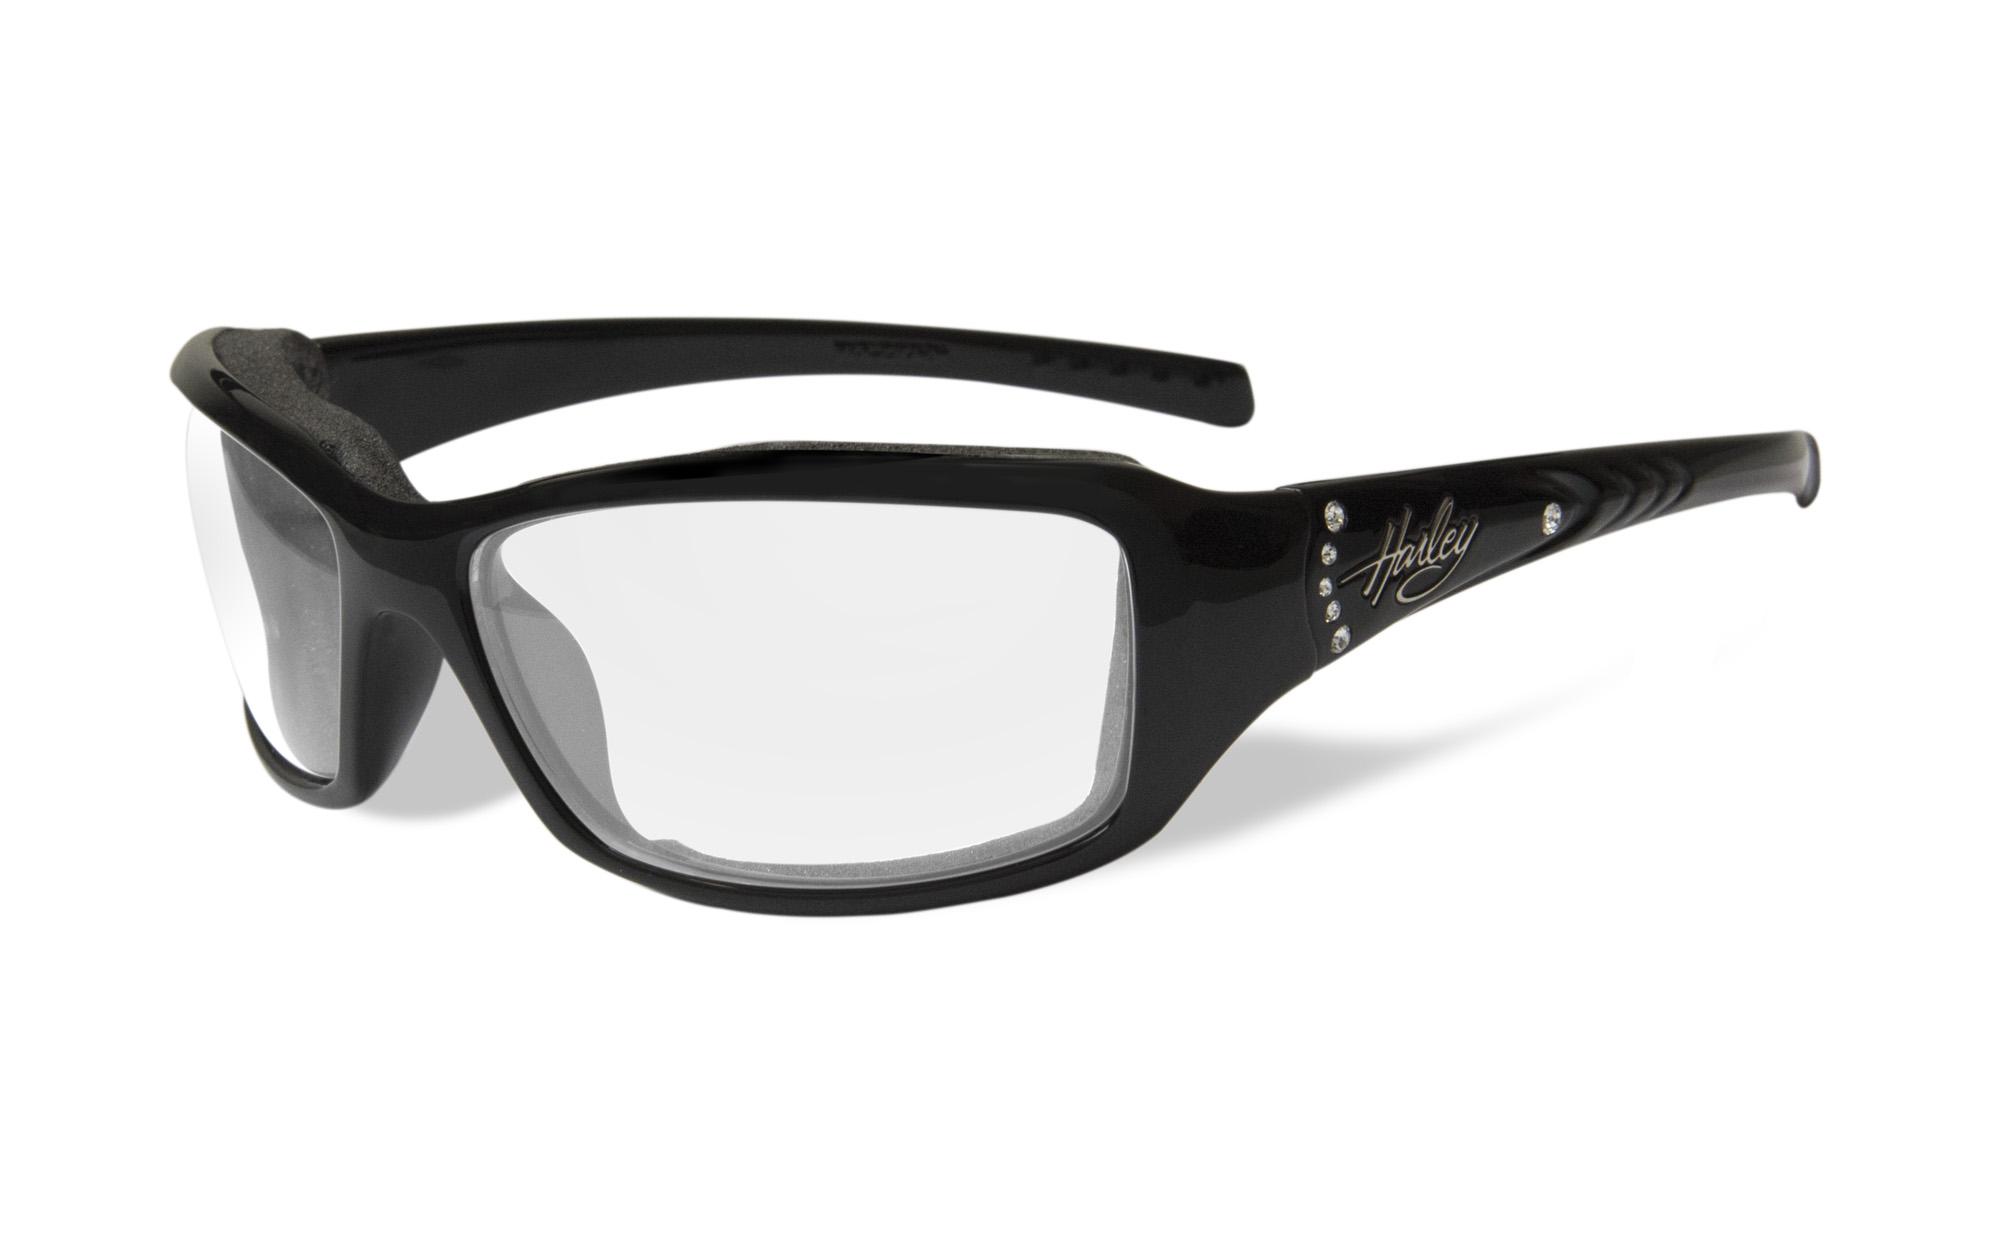 Harley-Davidson® Wiley-X® Tori Riding Glasses